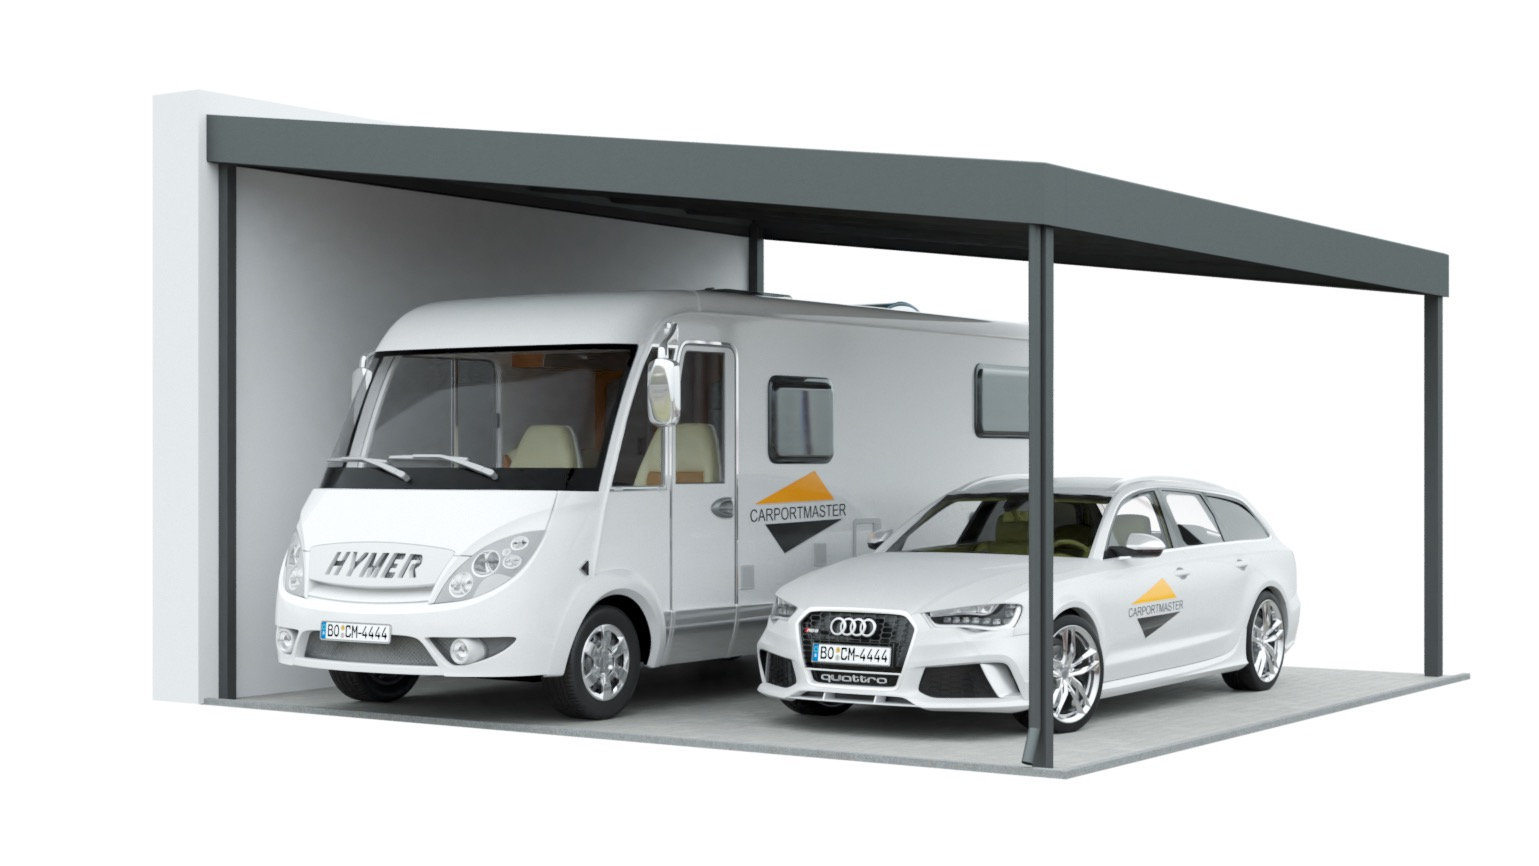 Wohnmobil Carport nach Maß aus Stahl - Carportmaster